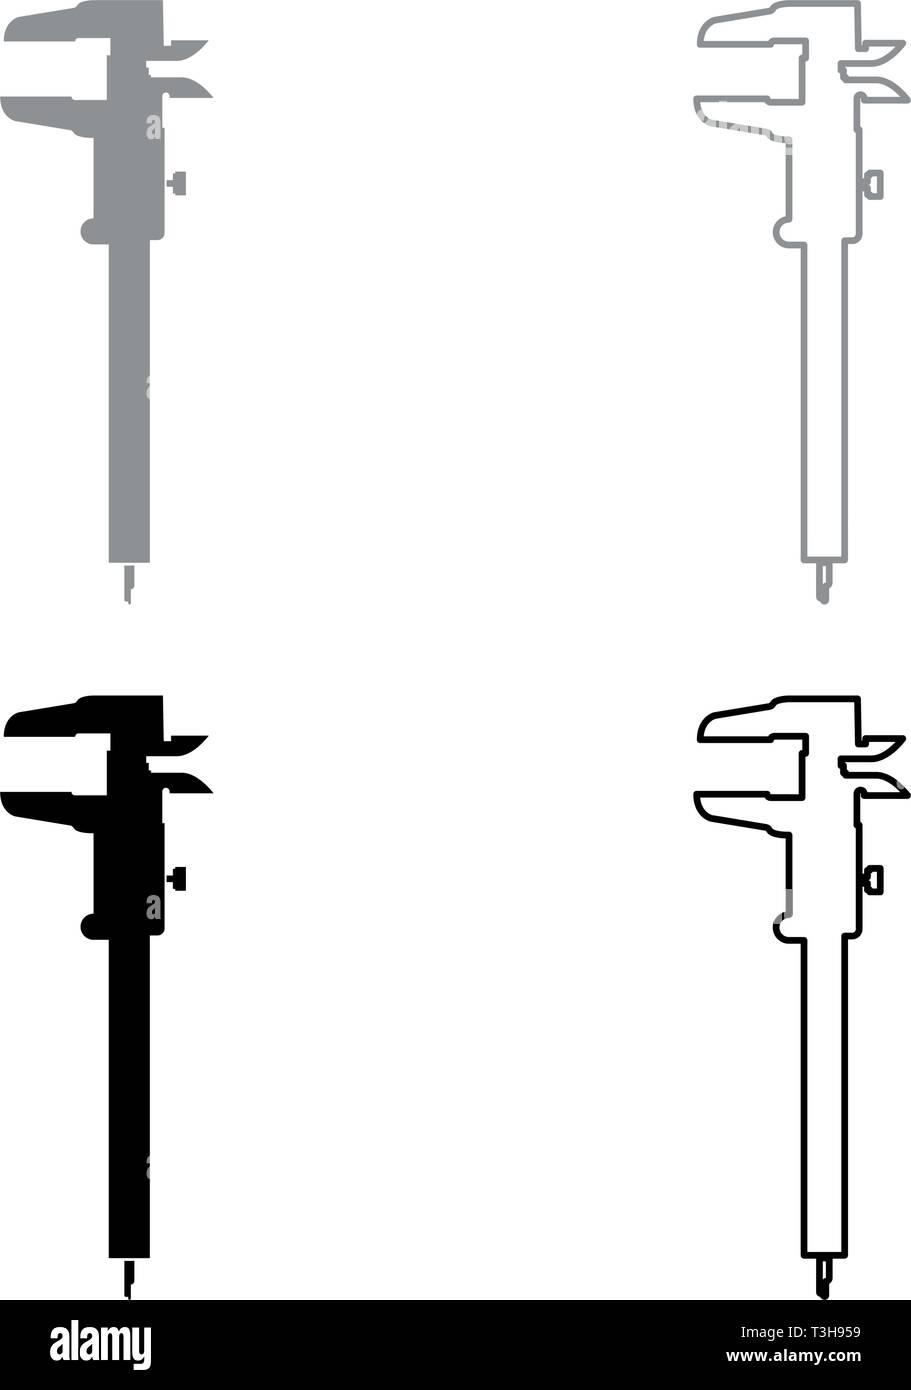 hight resolution of caliper hand caliper sliding caliper vernier caliper caliper gage slide gage trammel icon set black grey